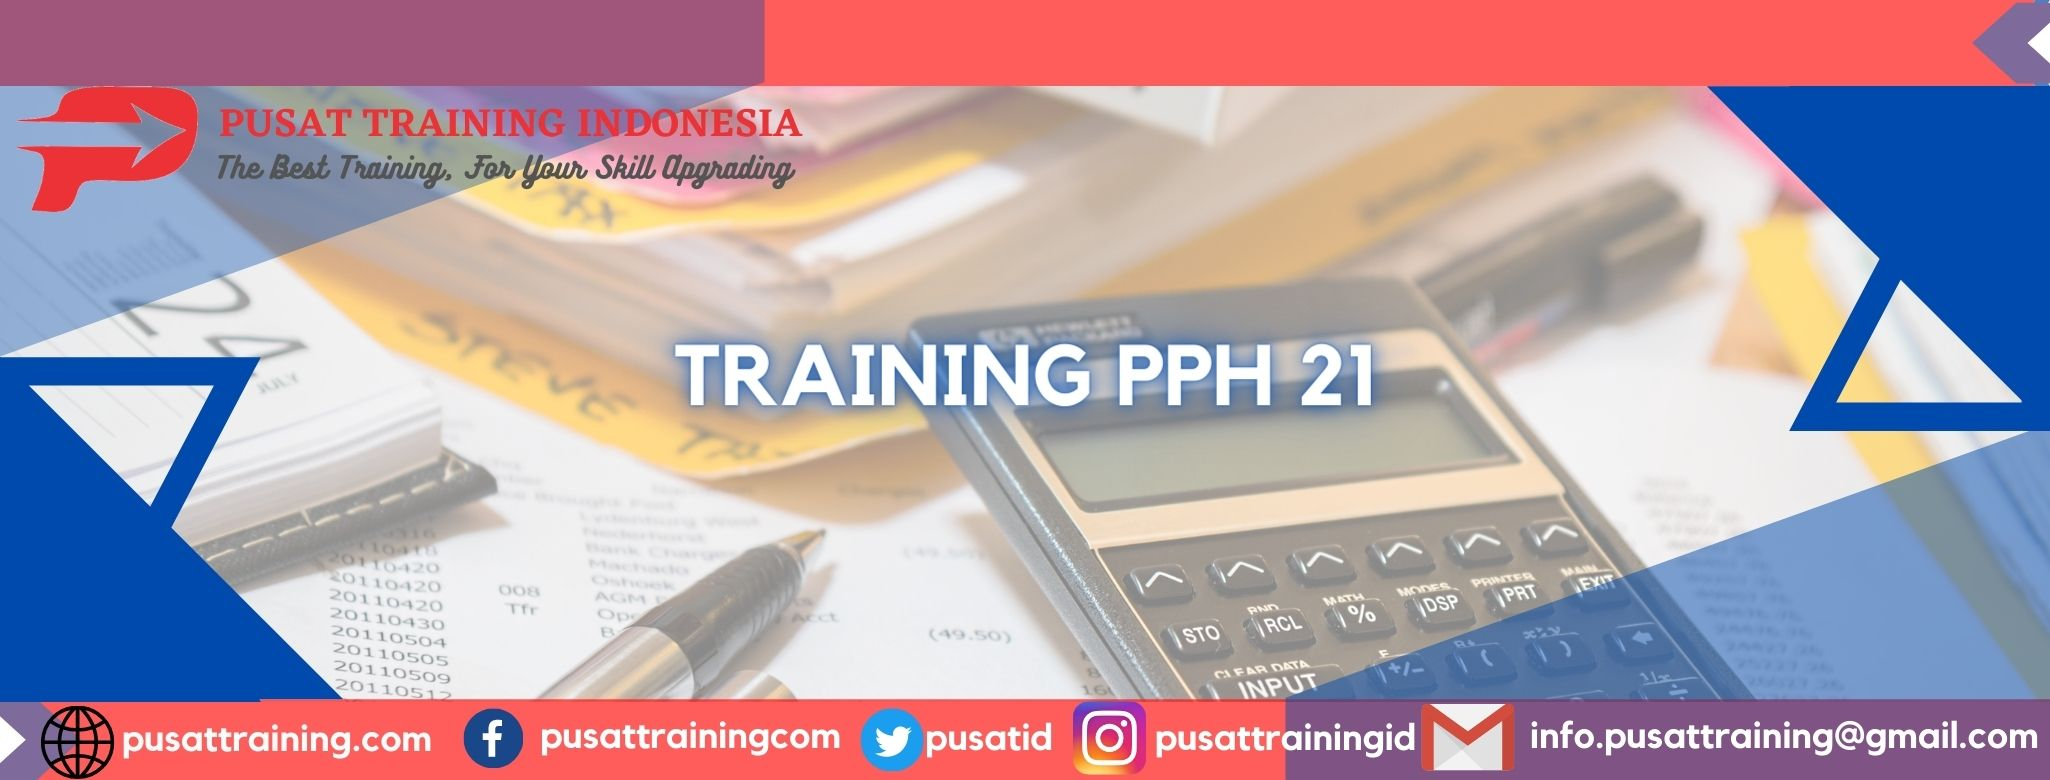 training-pph-21